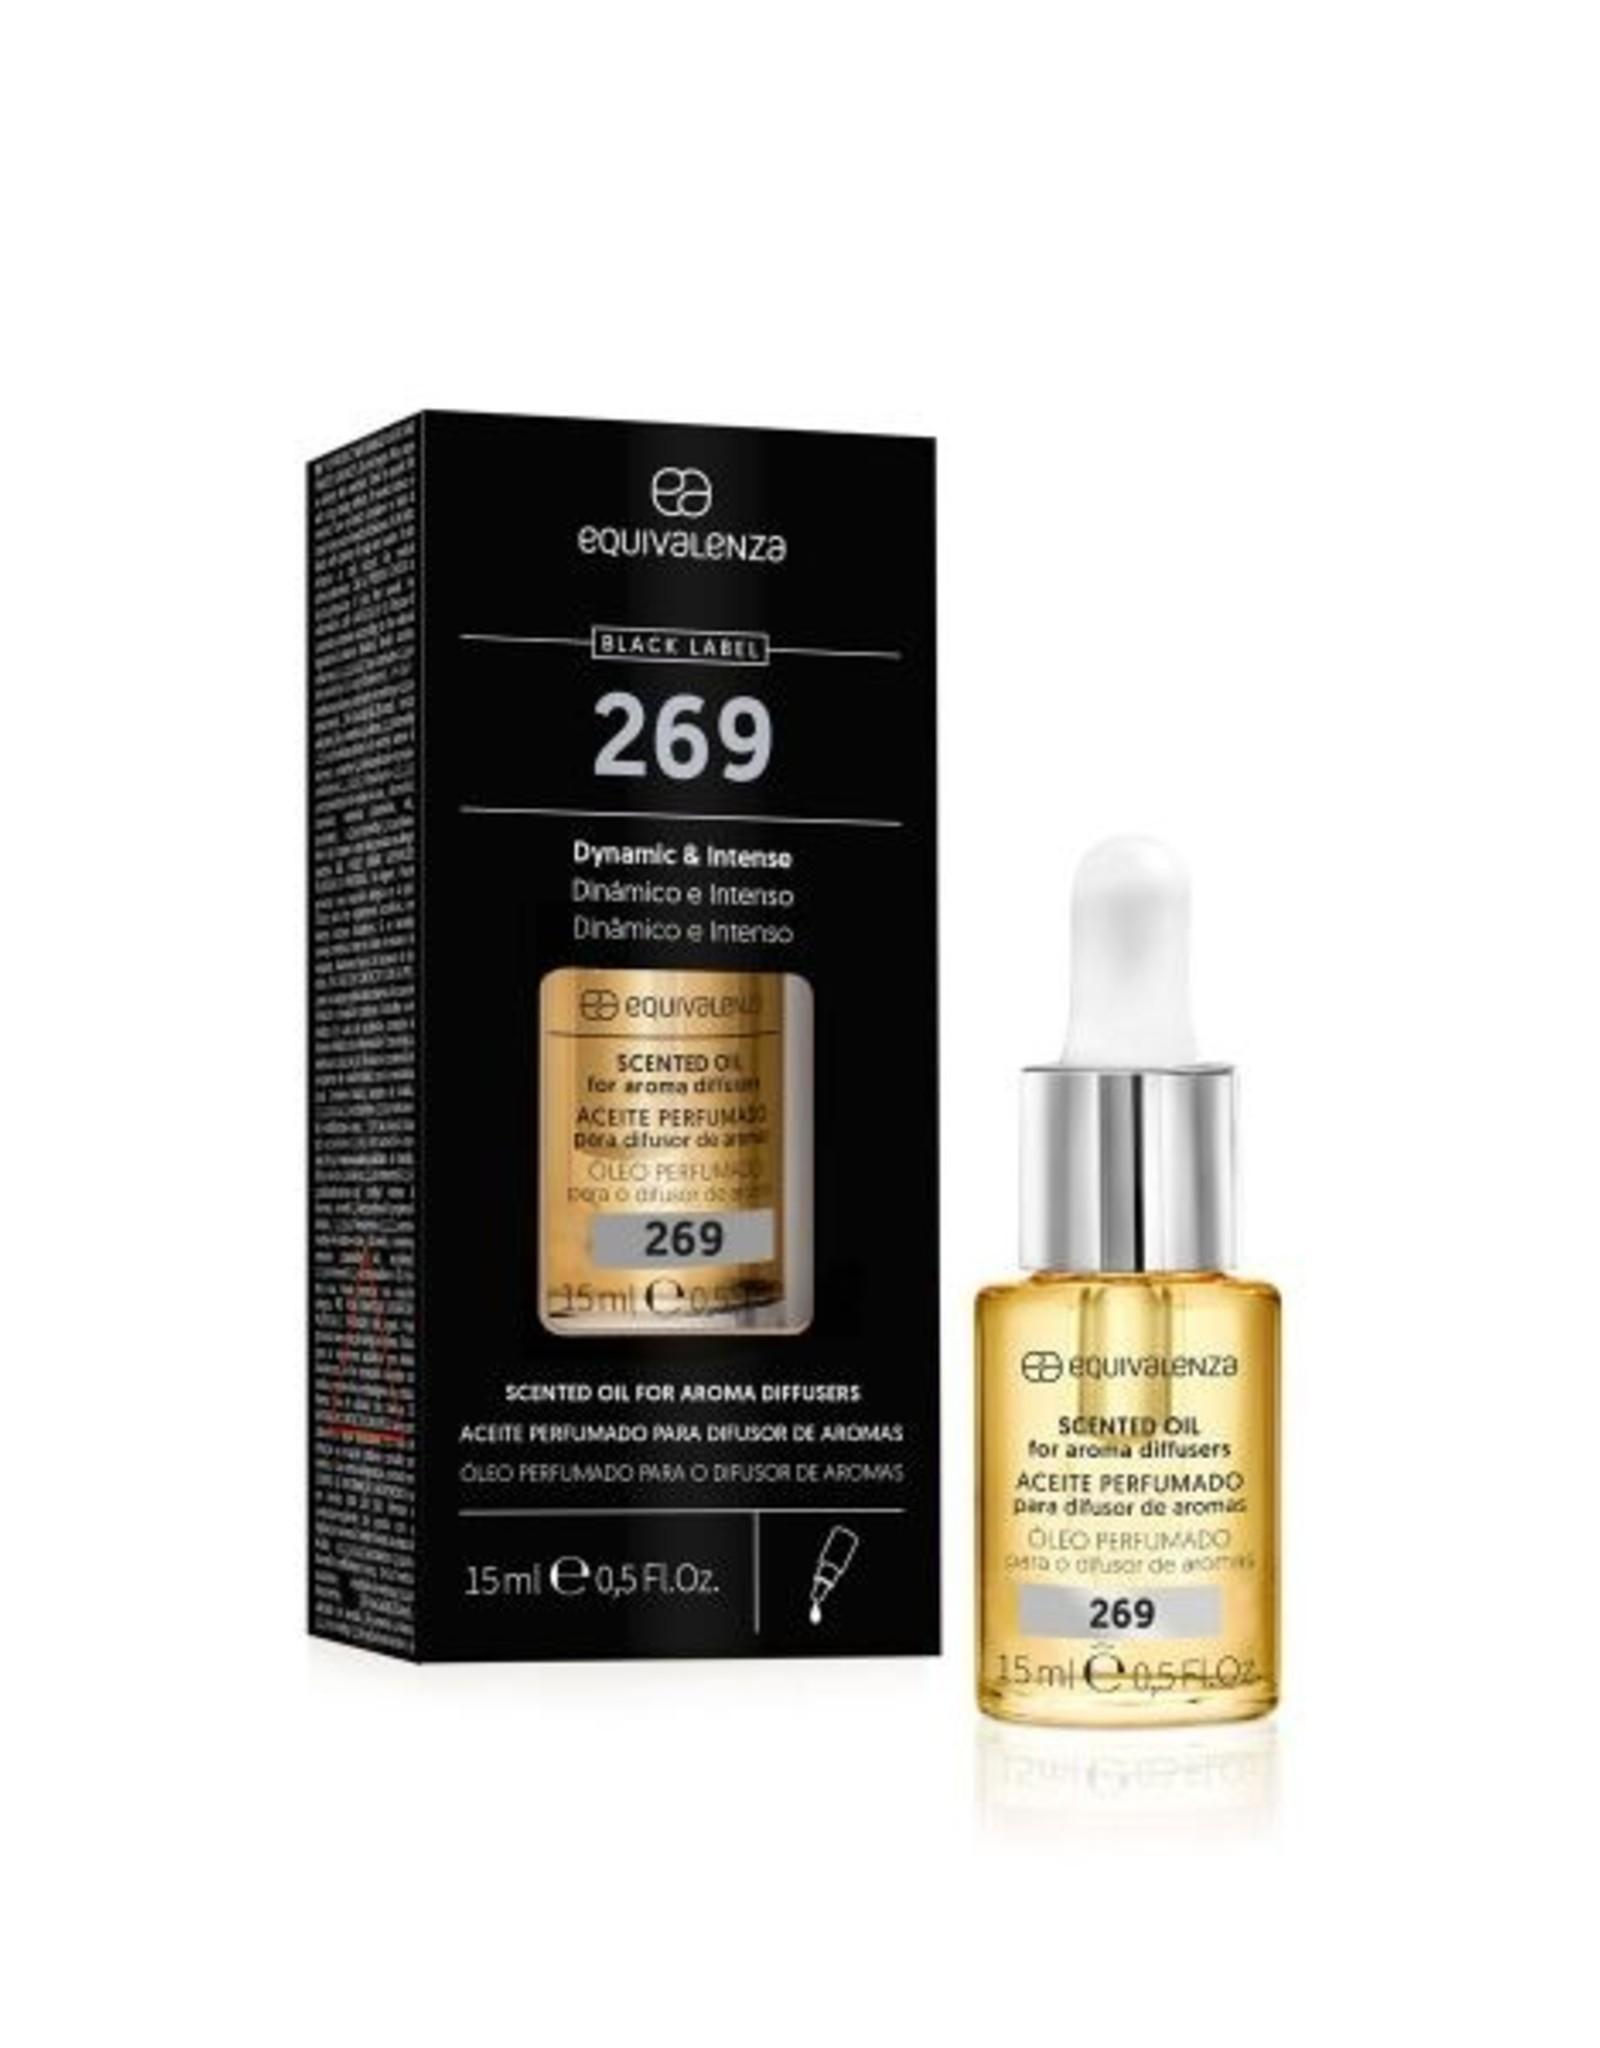 Equivalenza Huile Essentielle Parfumée Hydrosoluble – Black Label nº 269